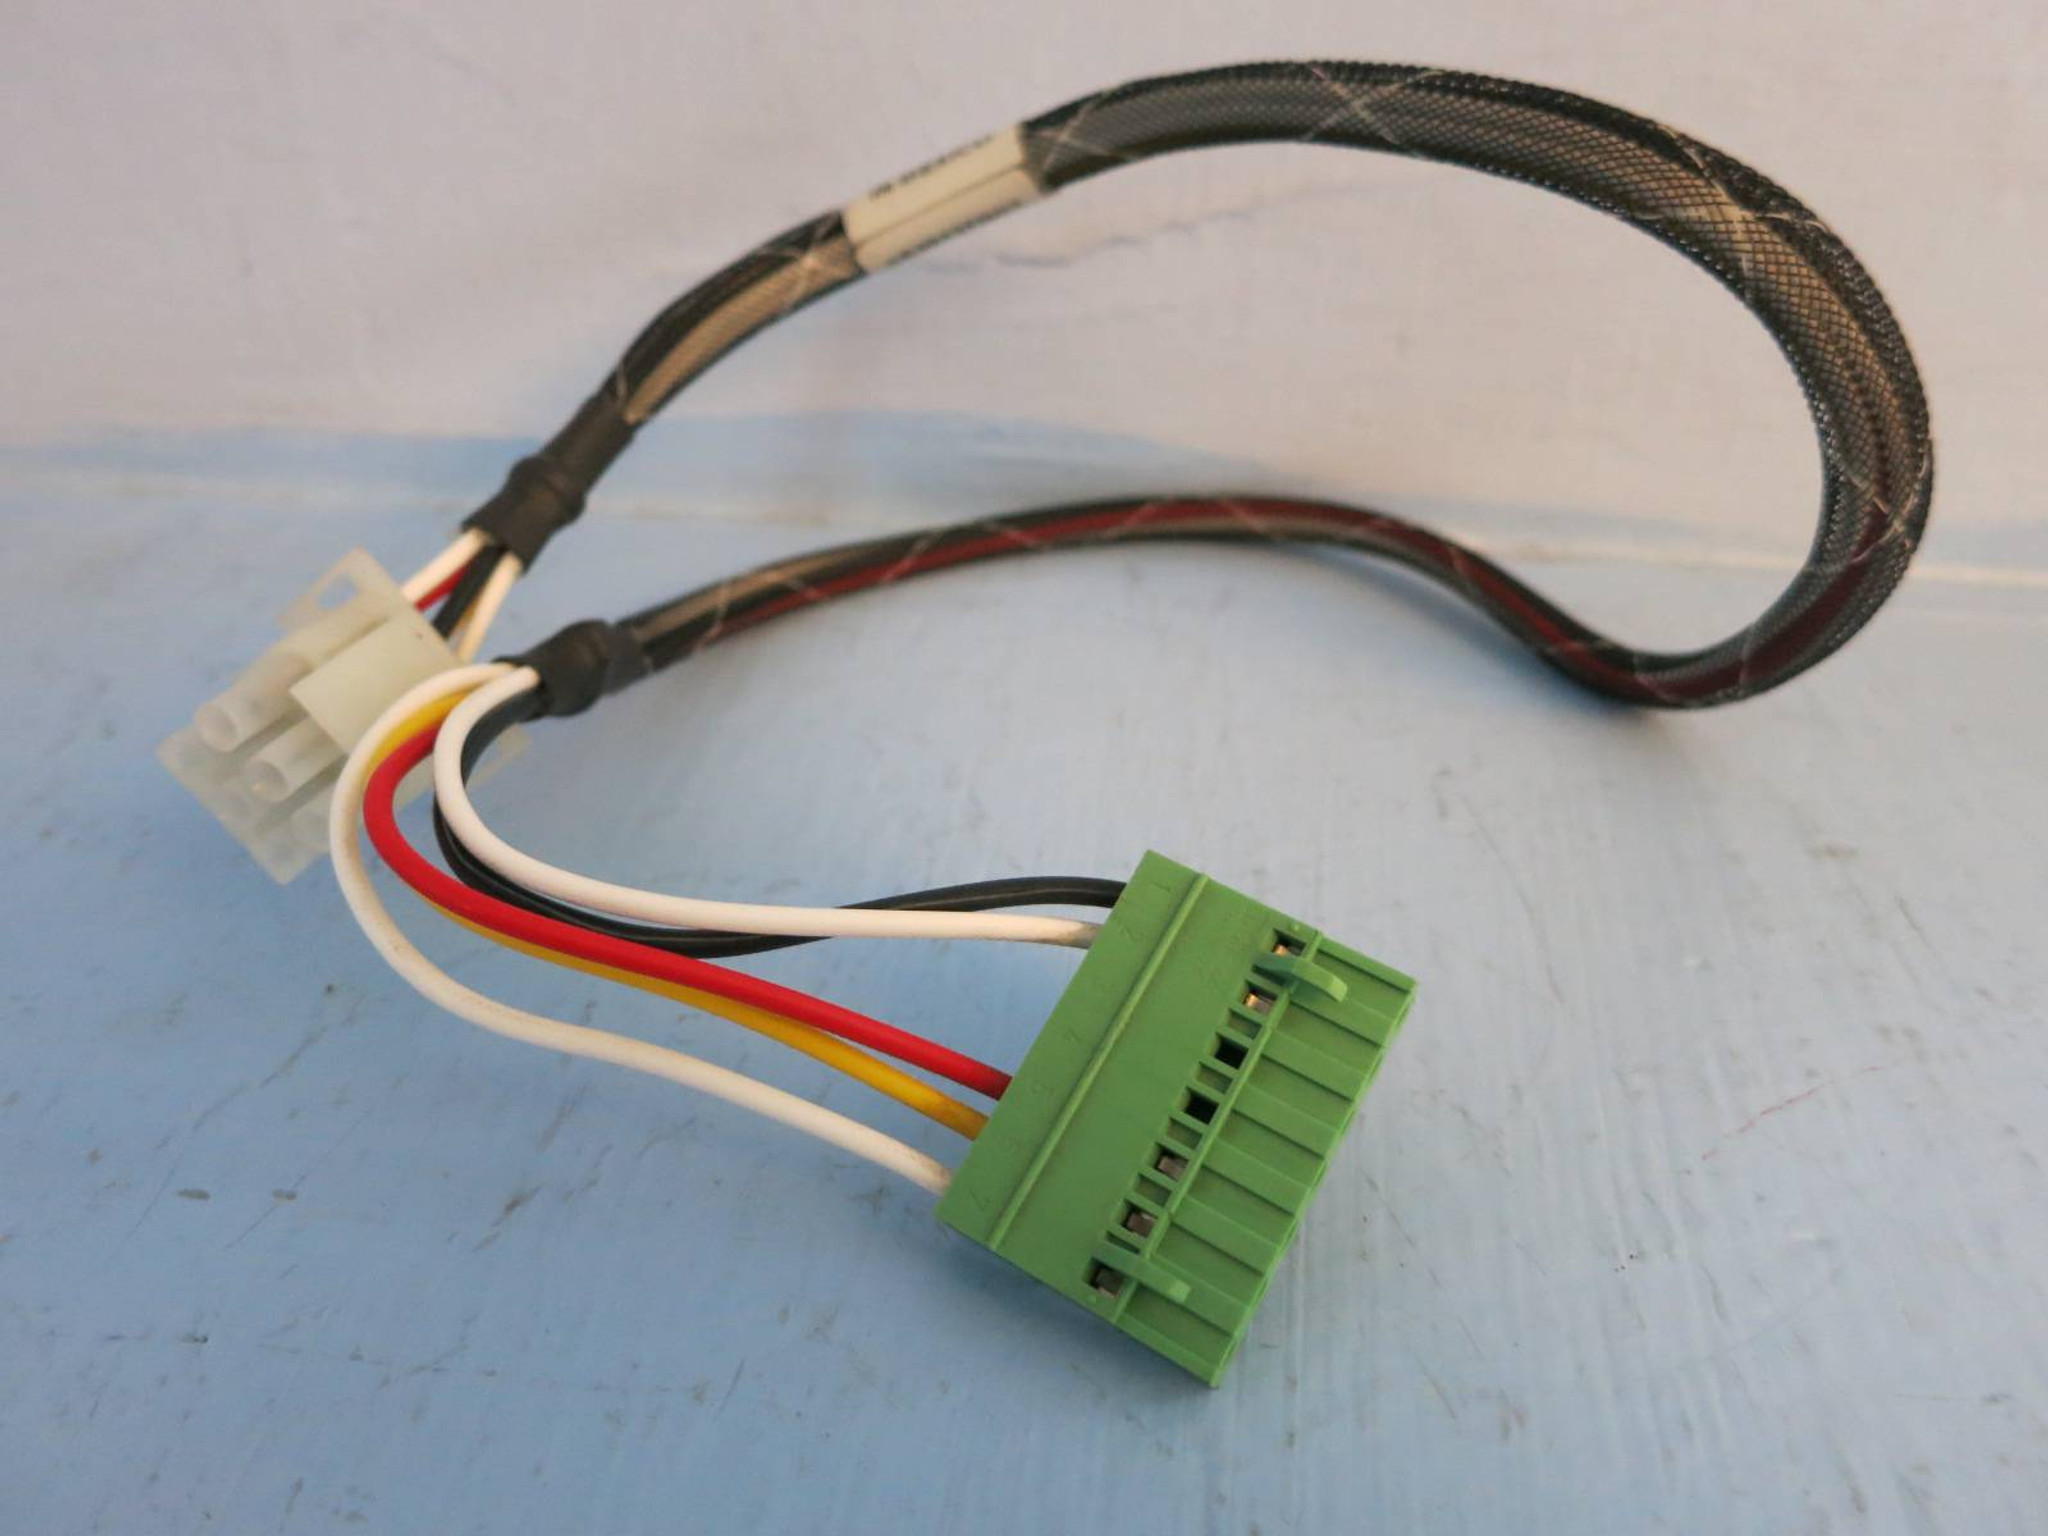 [DIAGRAM_5FD]  Ovation Power Cable 5A26137G03 PLC Westinghouse Emerson Distribution Harness  (PM2161-16) - River City Industrial | Ovation Wiring Harness |  | River City Industrial